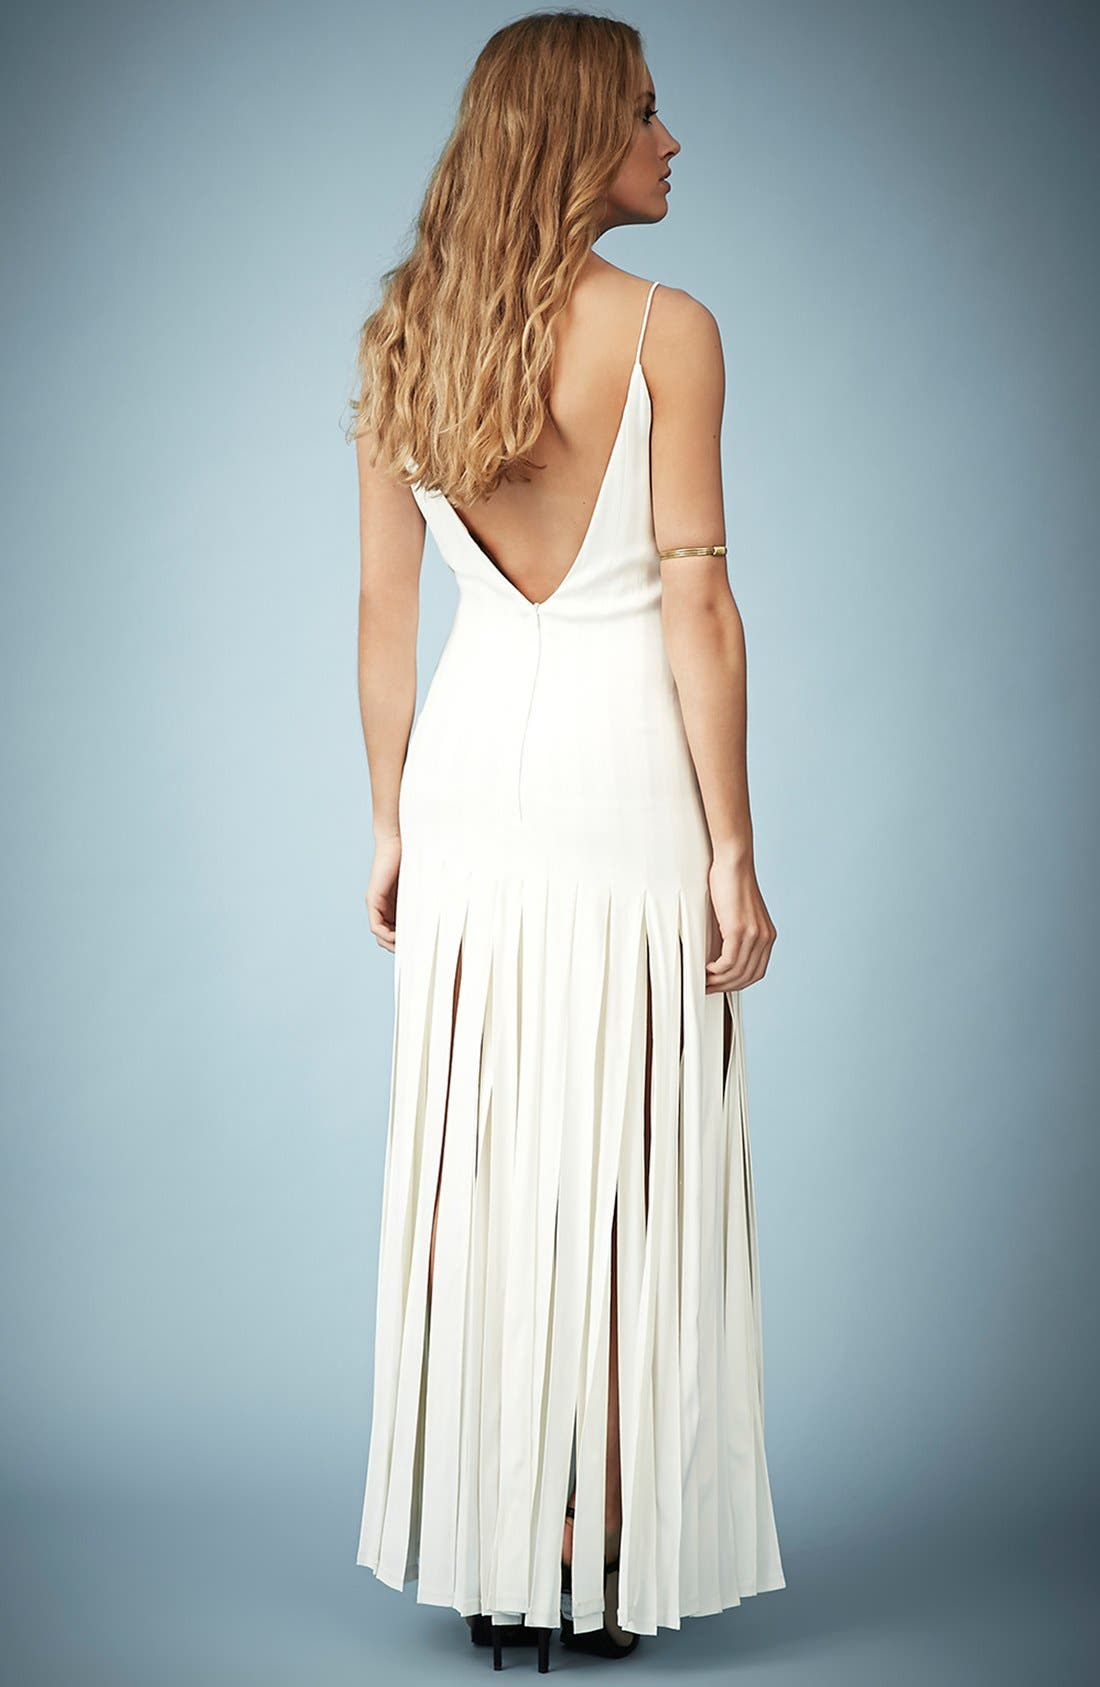 Alternate Image 2  - Kate Moss for Topshop Splice Skirt Maxi Dress (Online Only)